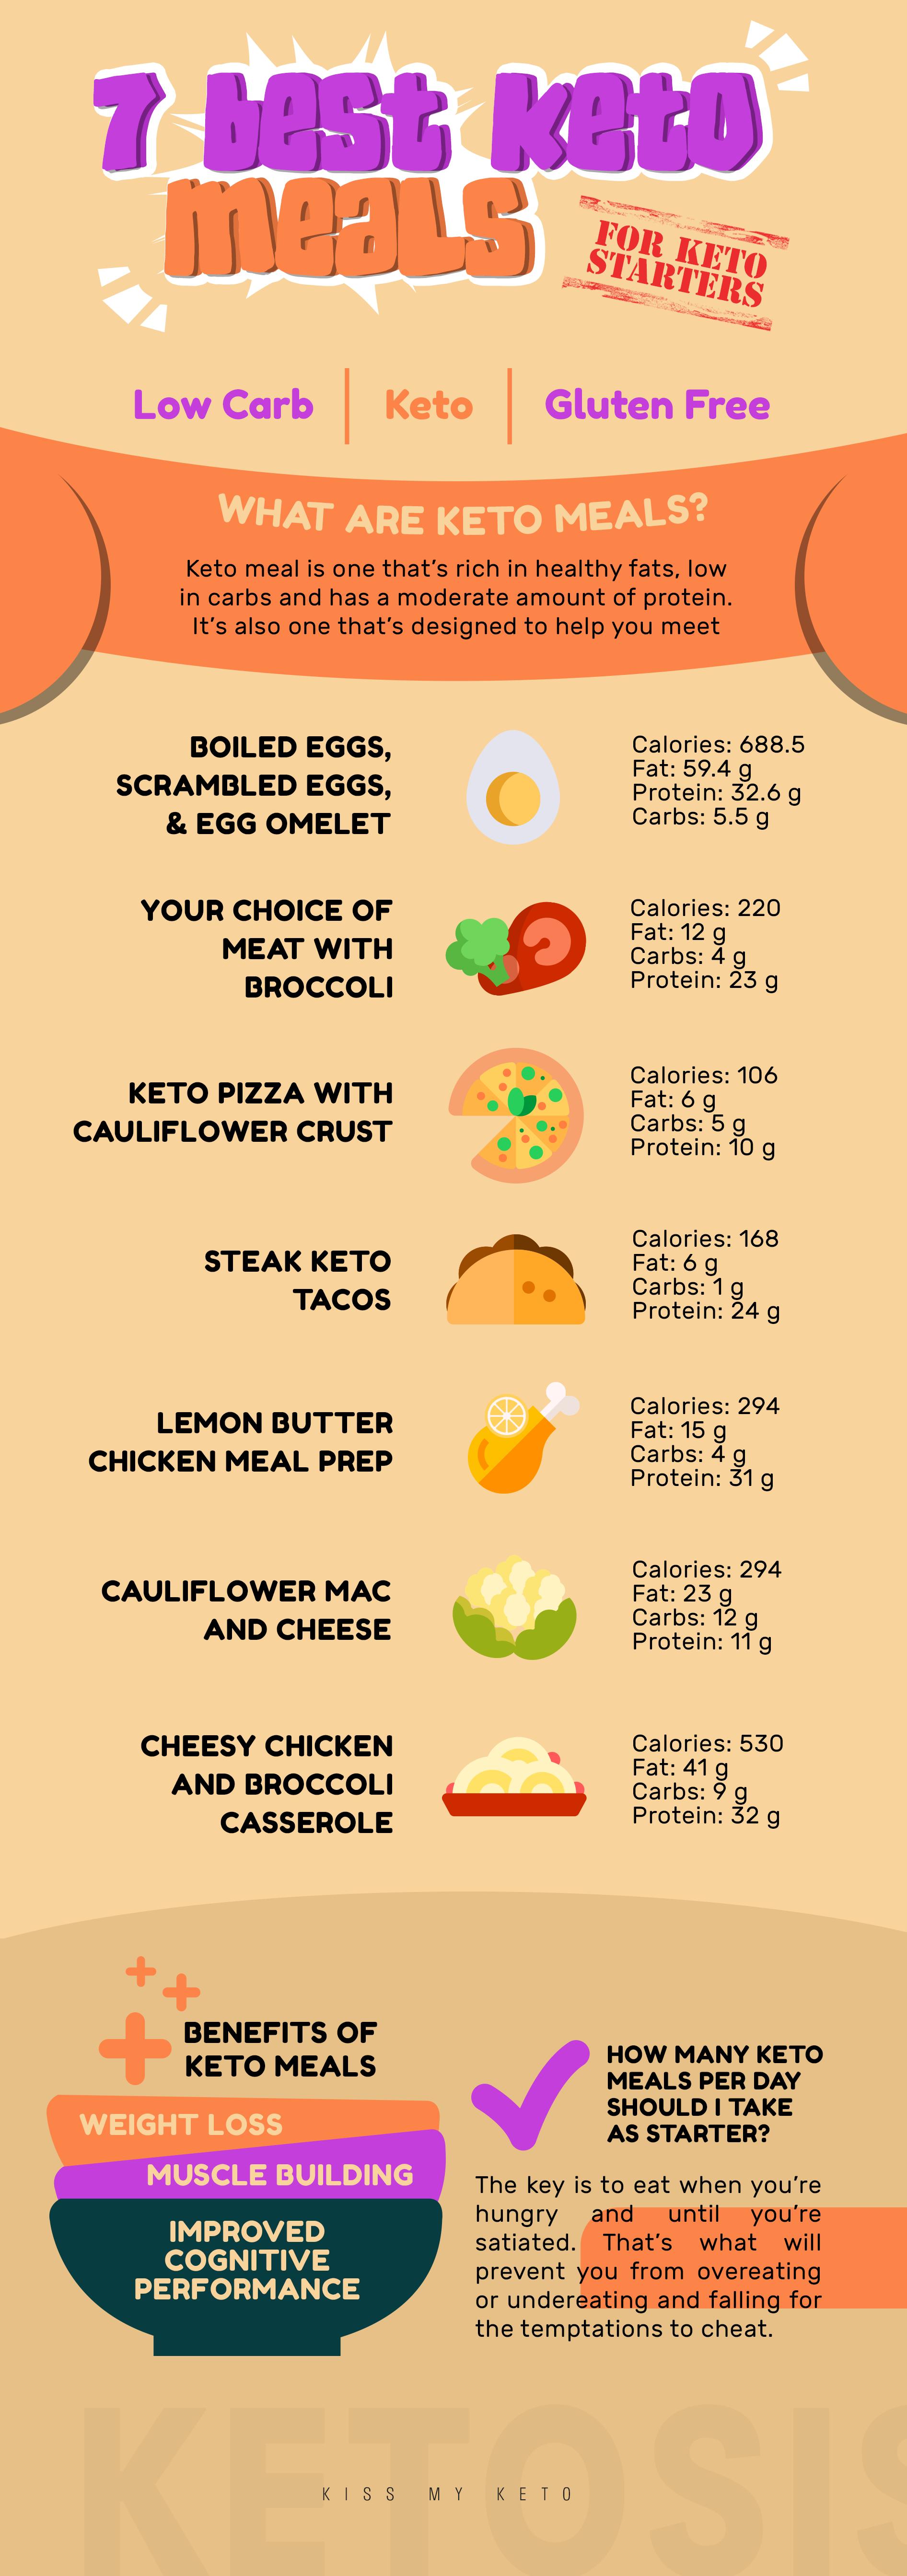 7 Best Keto Meals for Keto Beginners #ketodietforbeginners